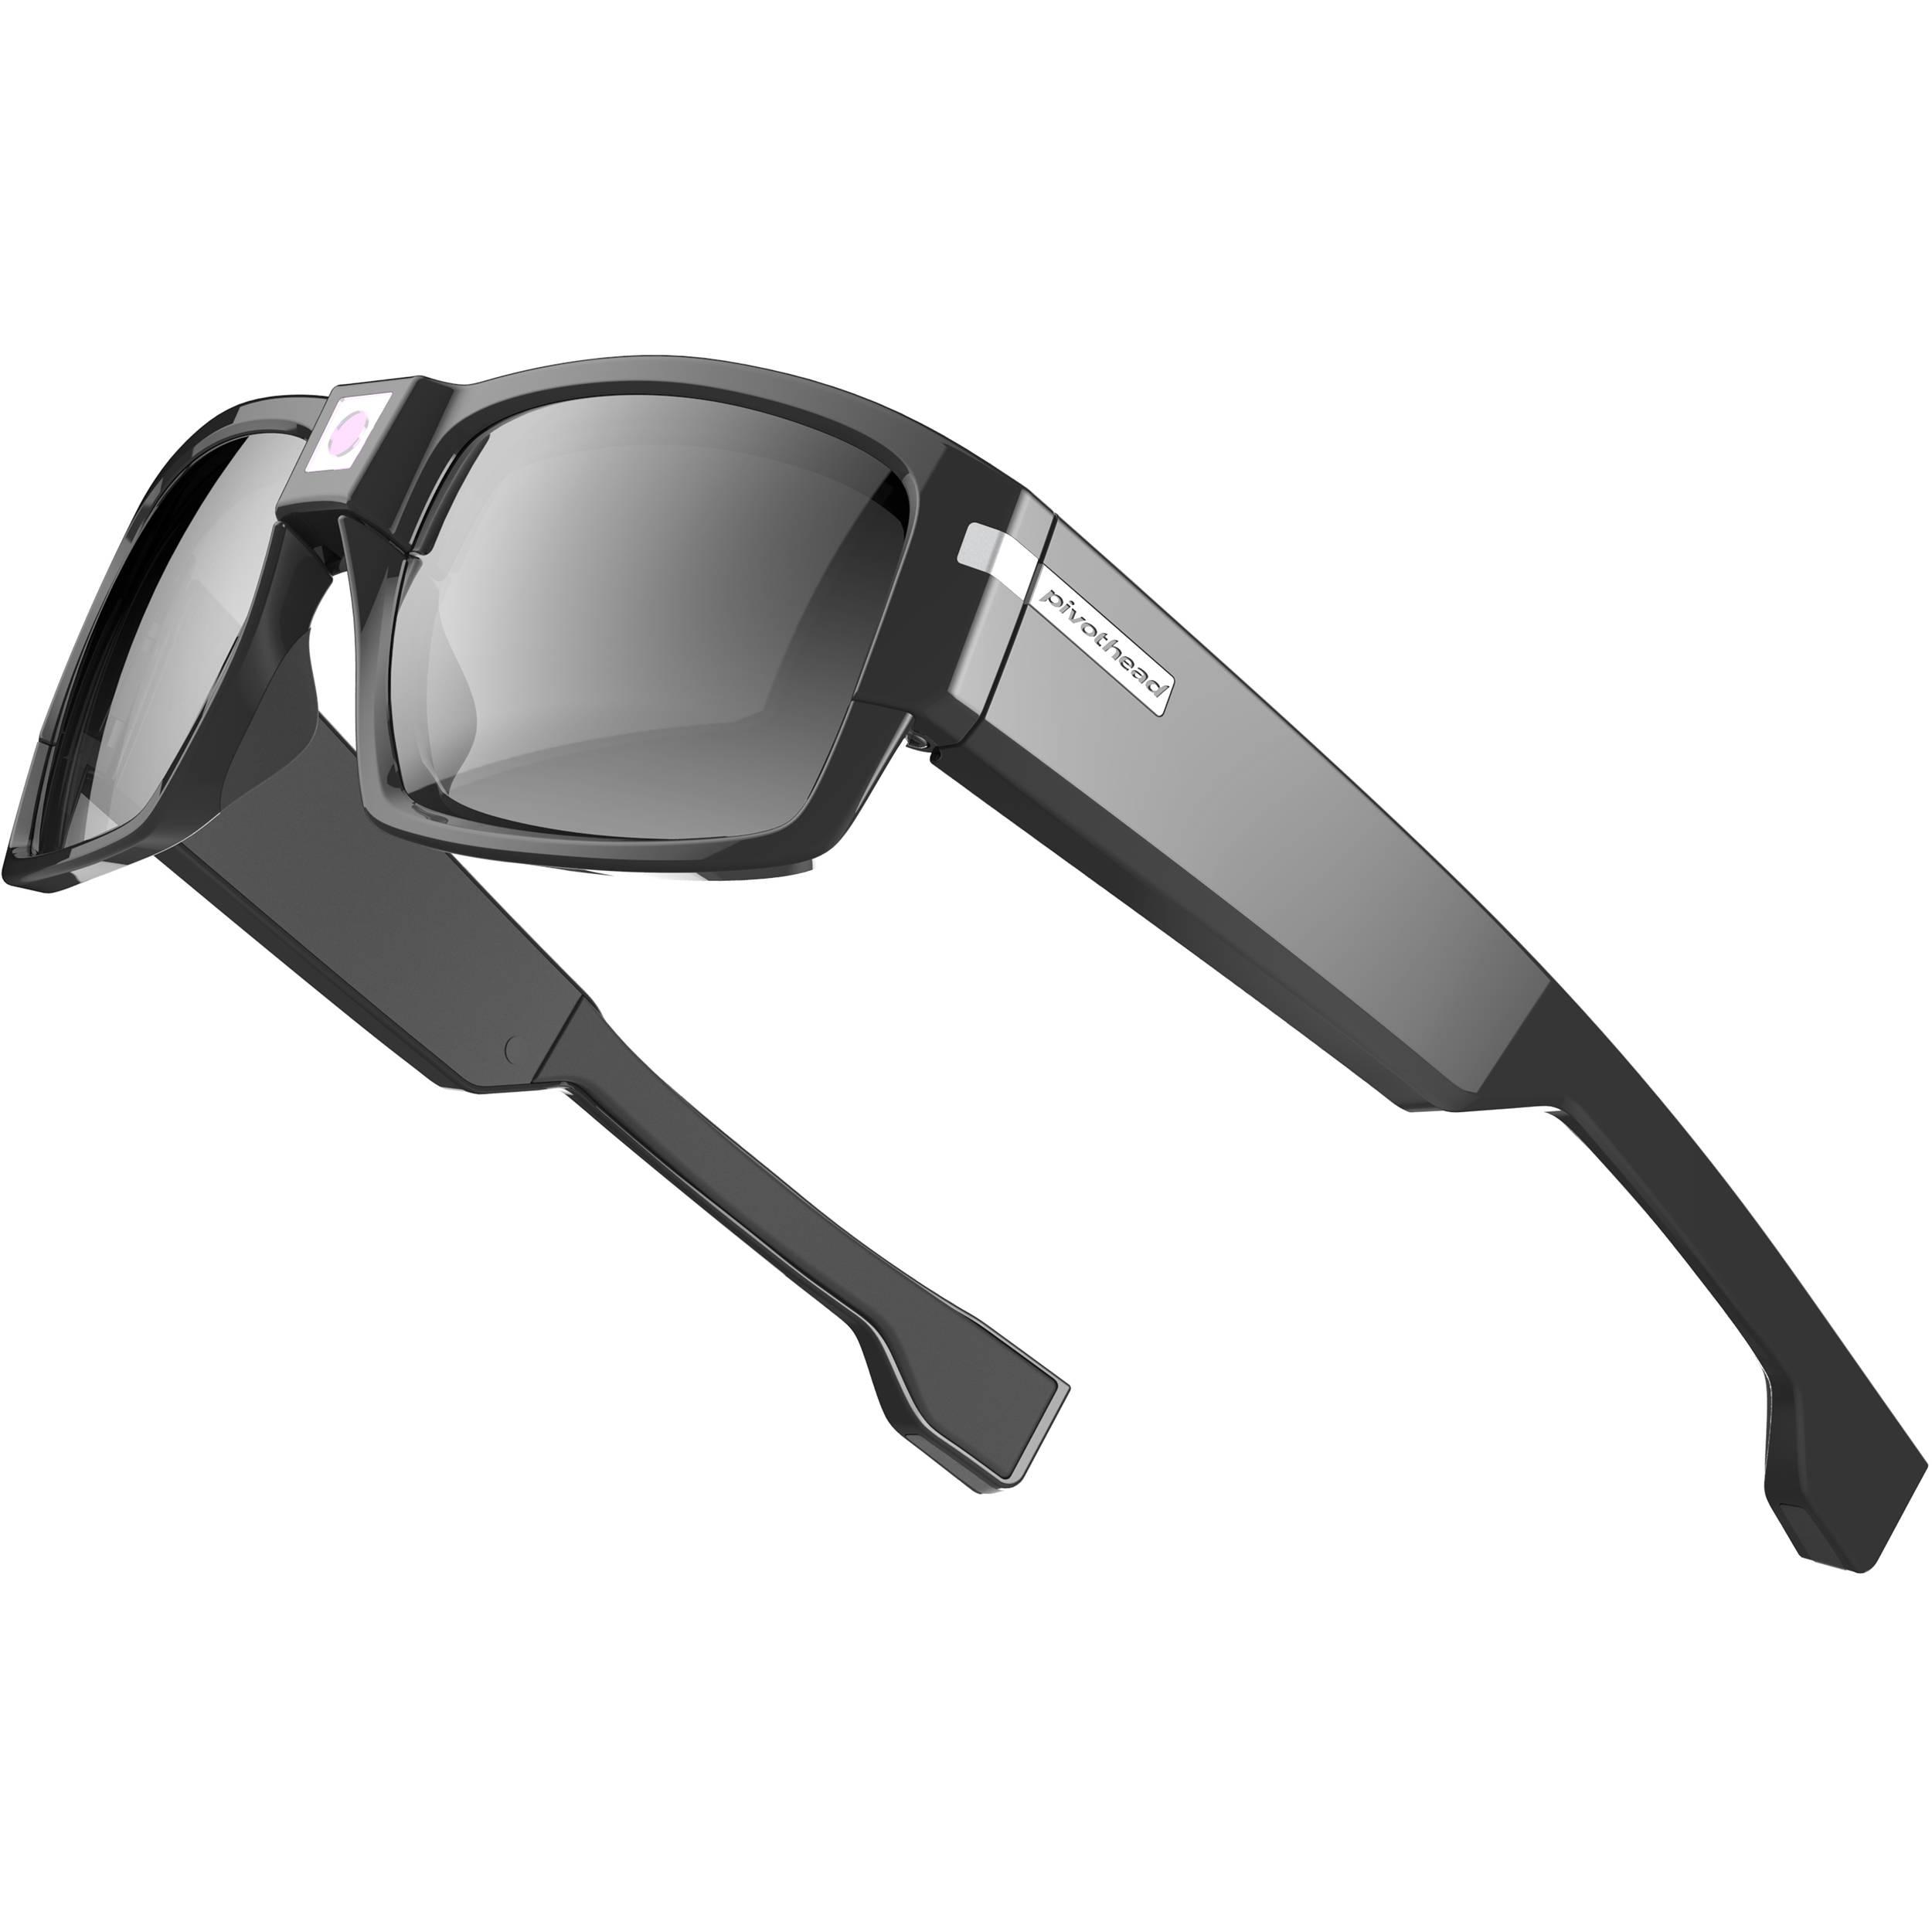 545b9e34e49a Pivothead SMART Eyewear Architect Edition (Obsidian) G2OB01 B H